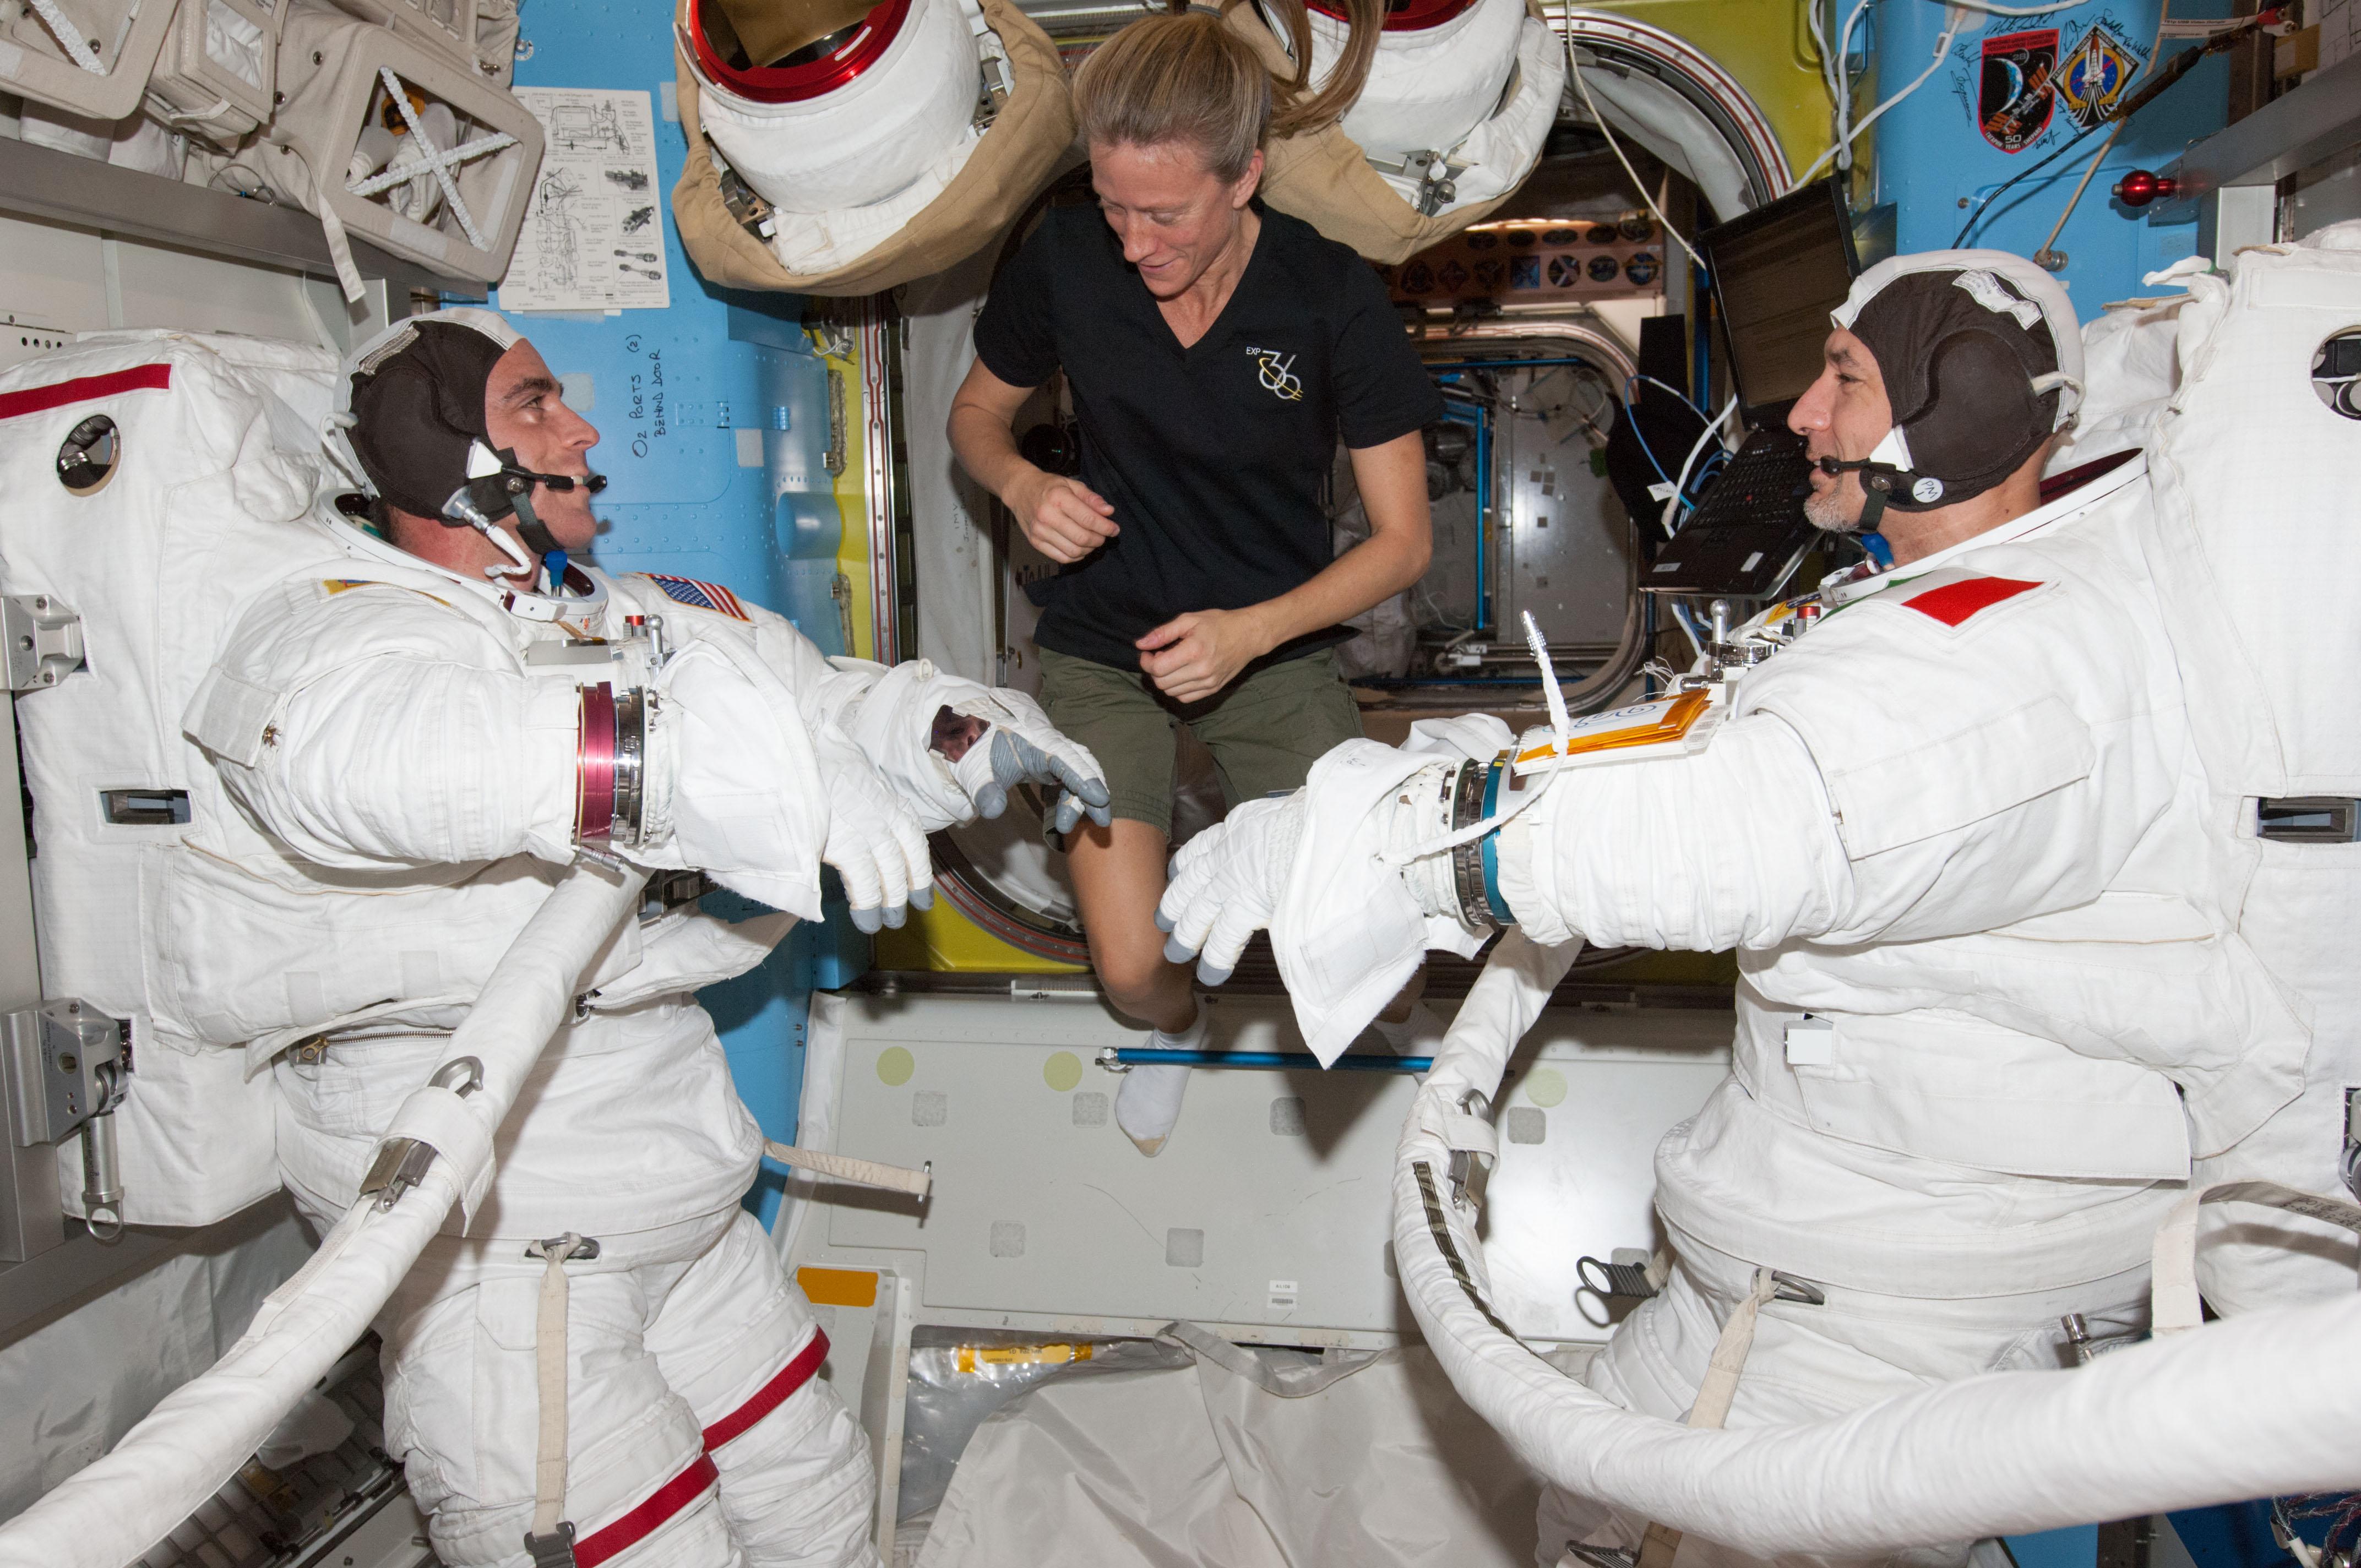 Station Astronauts Prep for U.S. Spacewalk | NASA